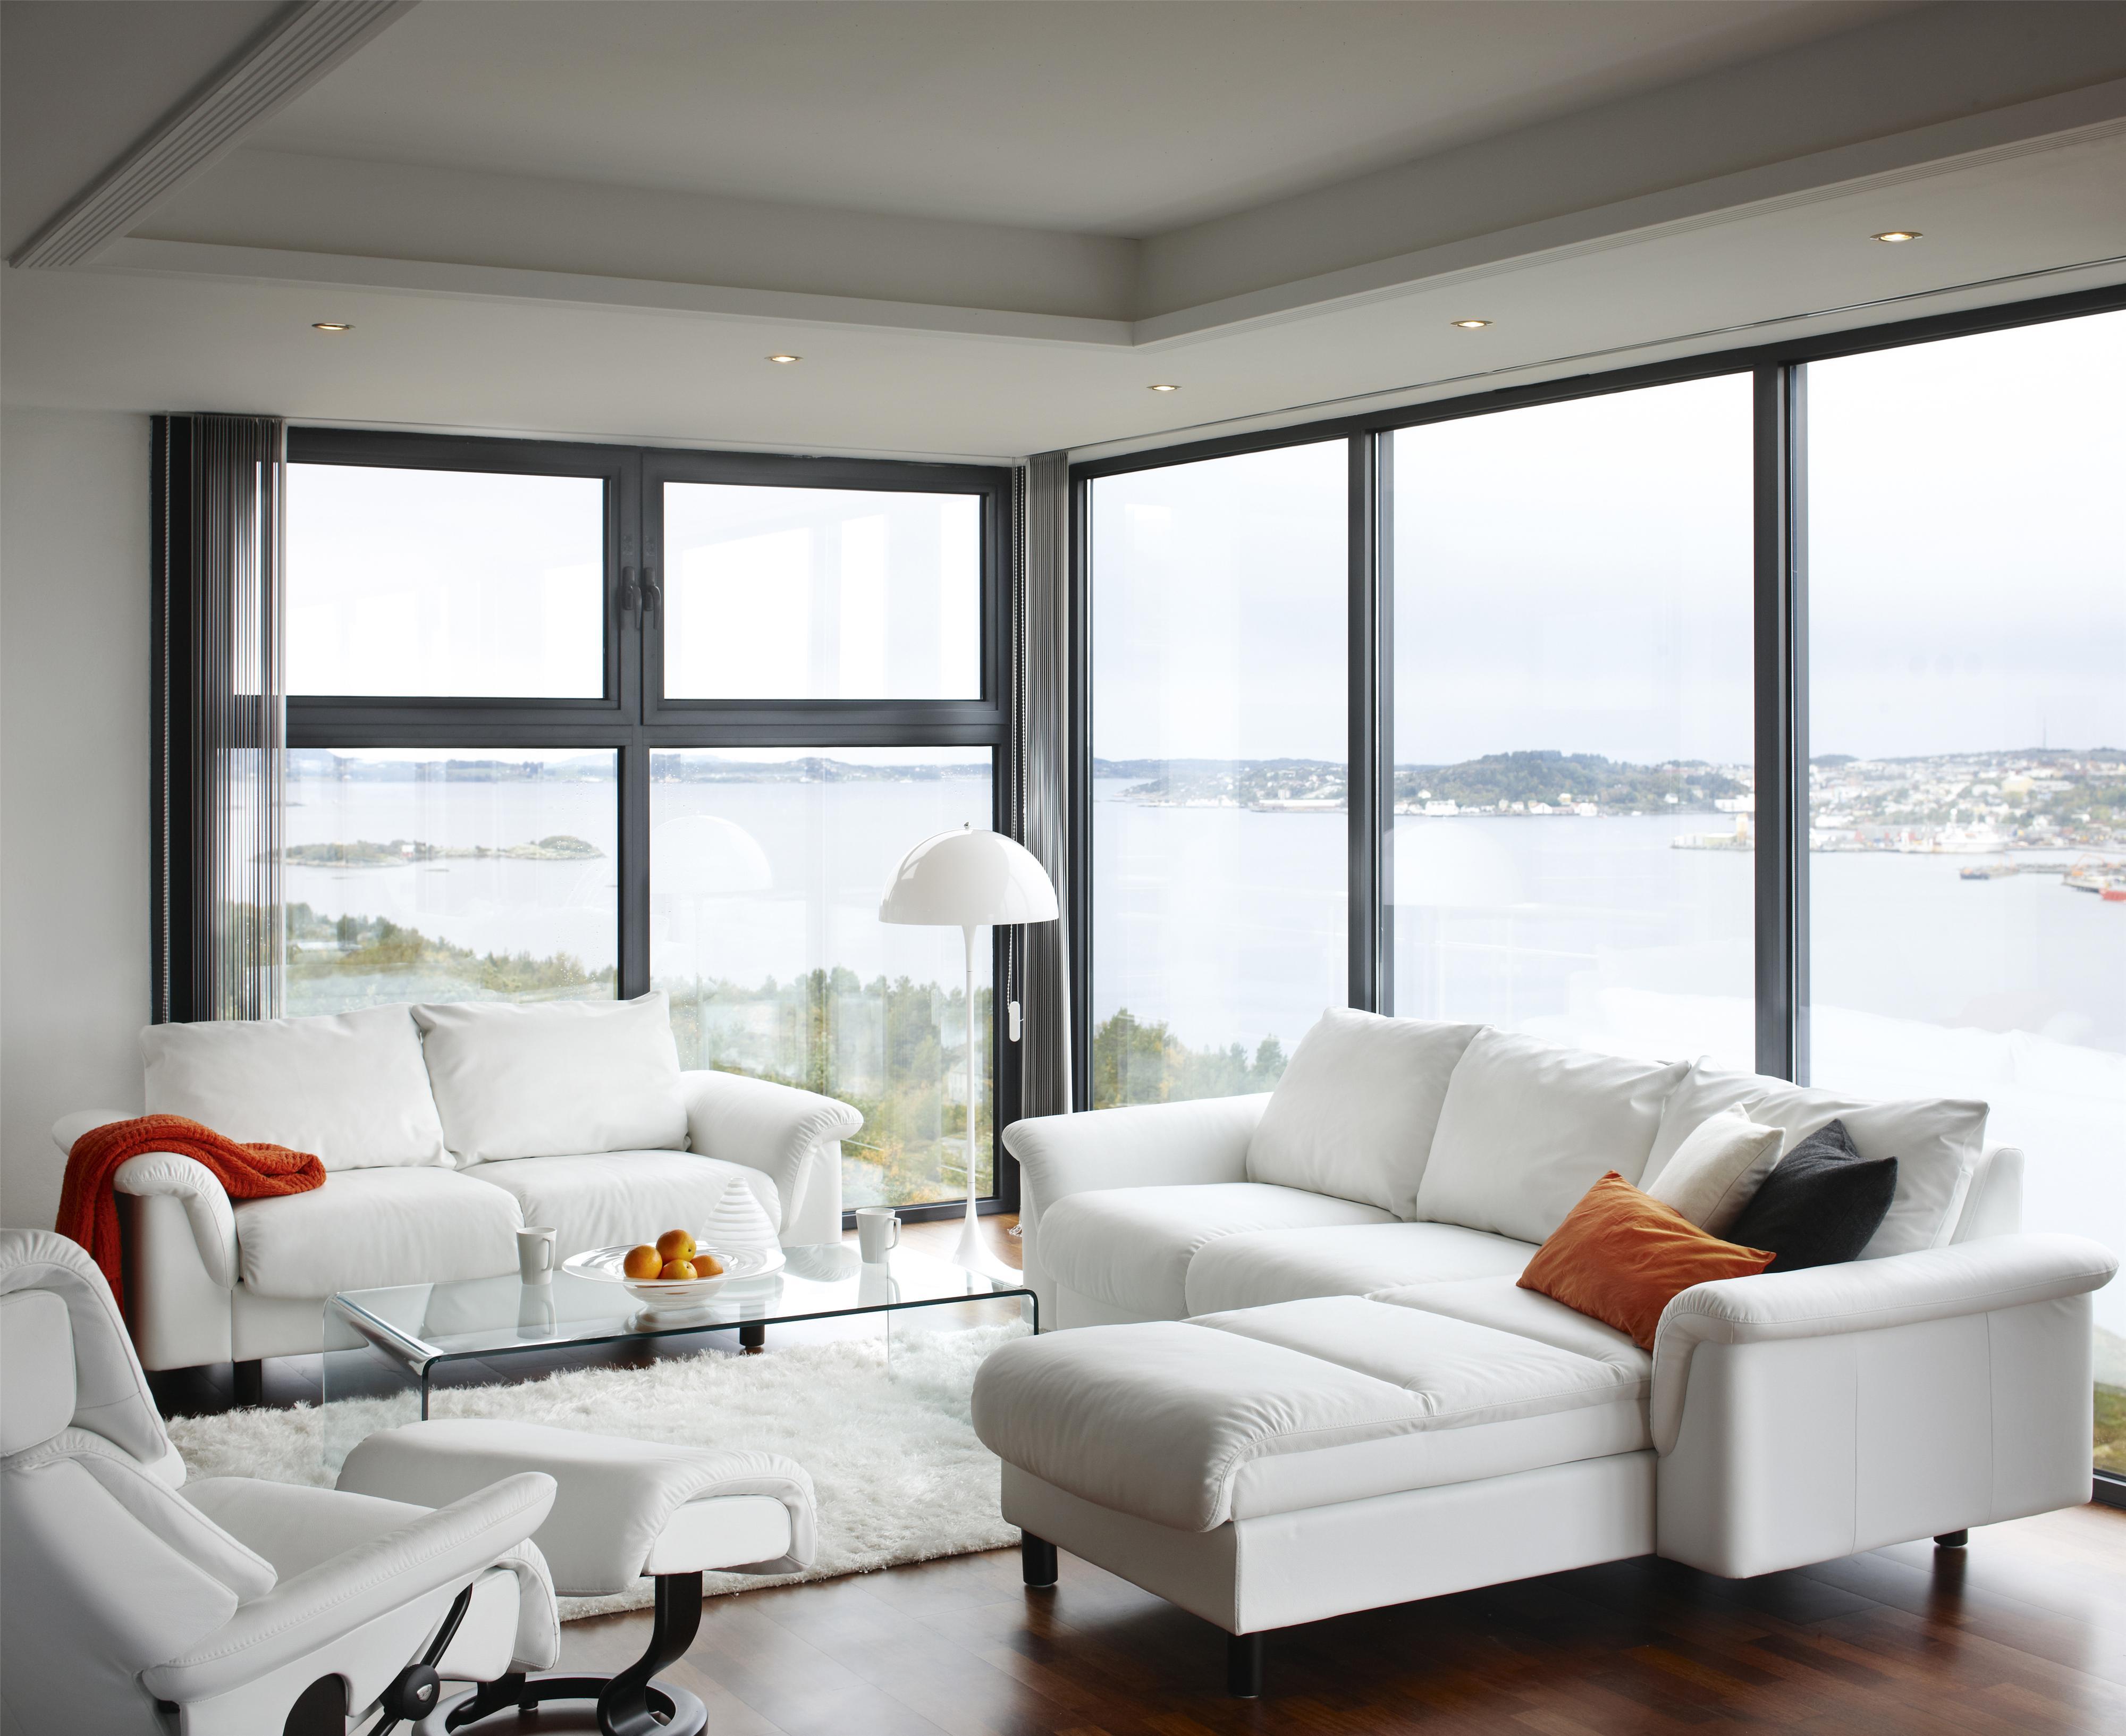 stressless e300 1271020 2 seater loveseat hudson 39 s furniture love seats. Black Bedroom Furniture Sets. Home Design Ideas